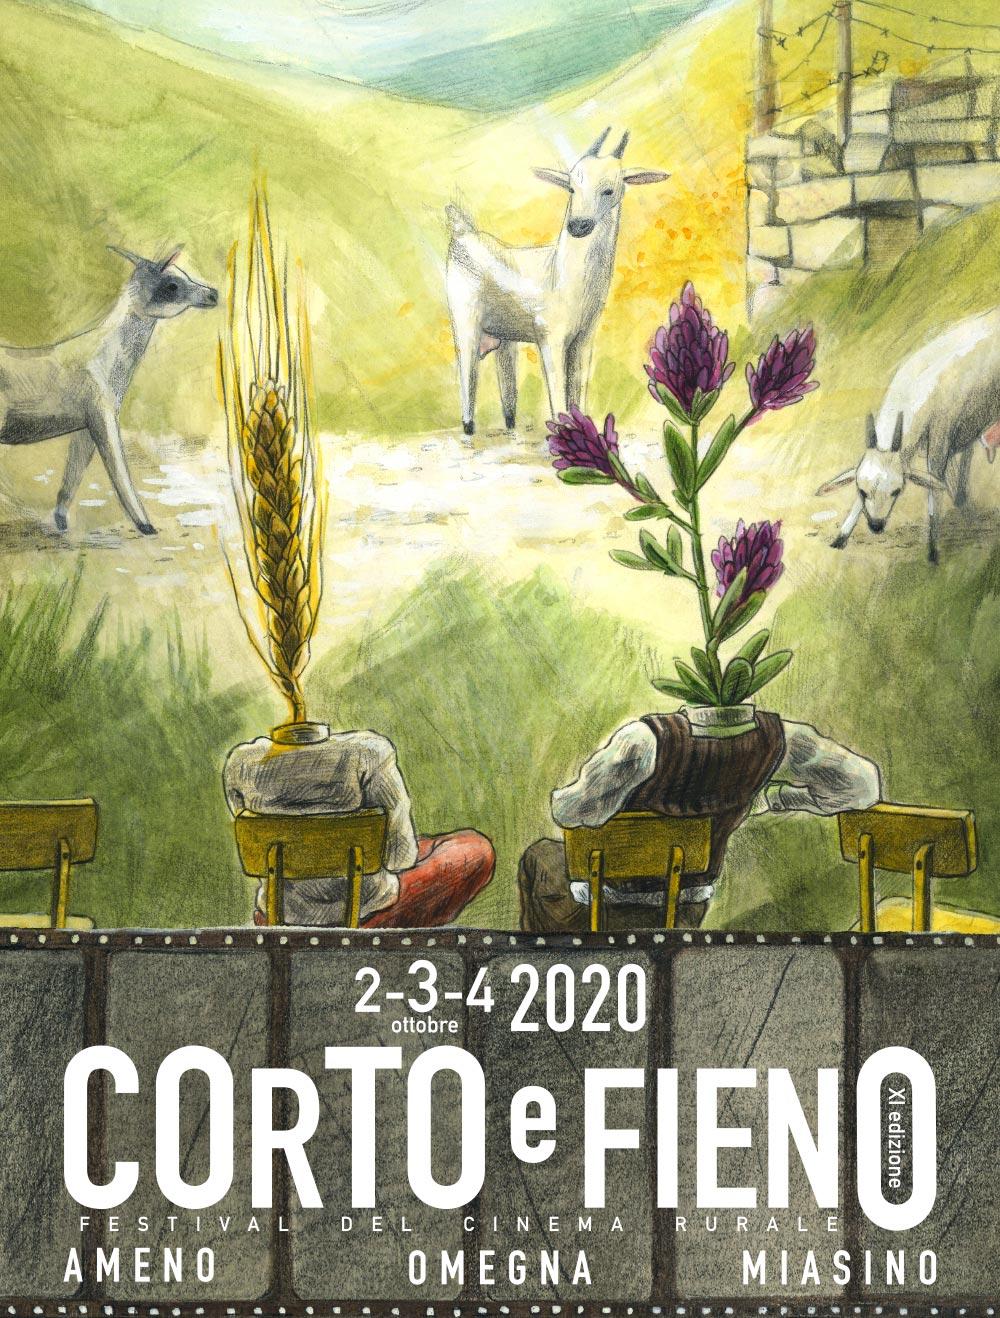 locandina_cortoefieno_2020